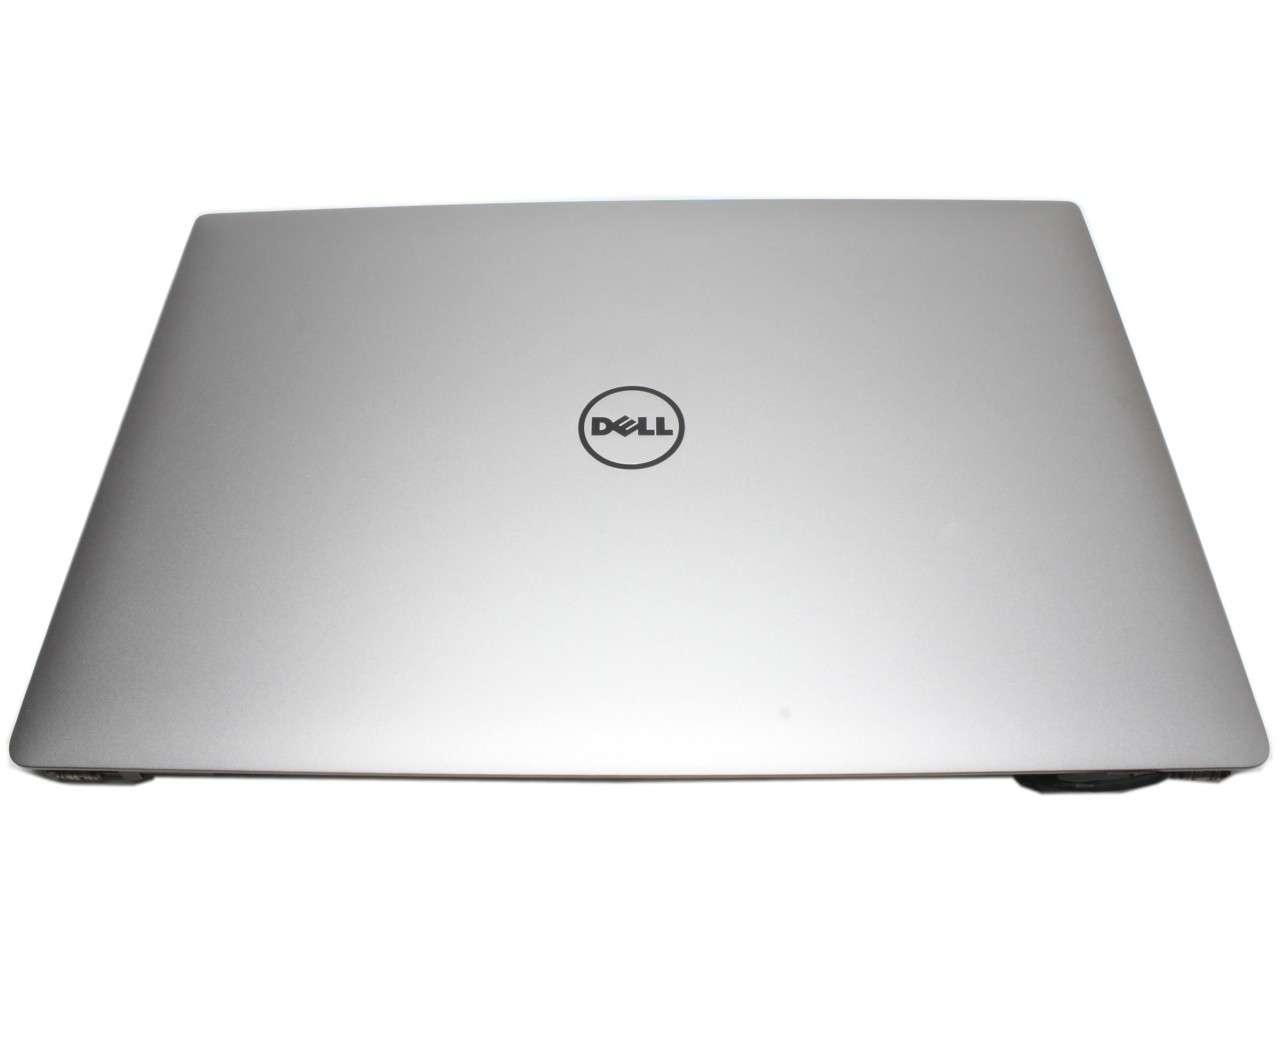 Ansamblu Ecran cu Touchscreen UHD 4K Dell XPS 15 9550 imagine powerlaptop.ro 2021